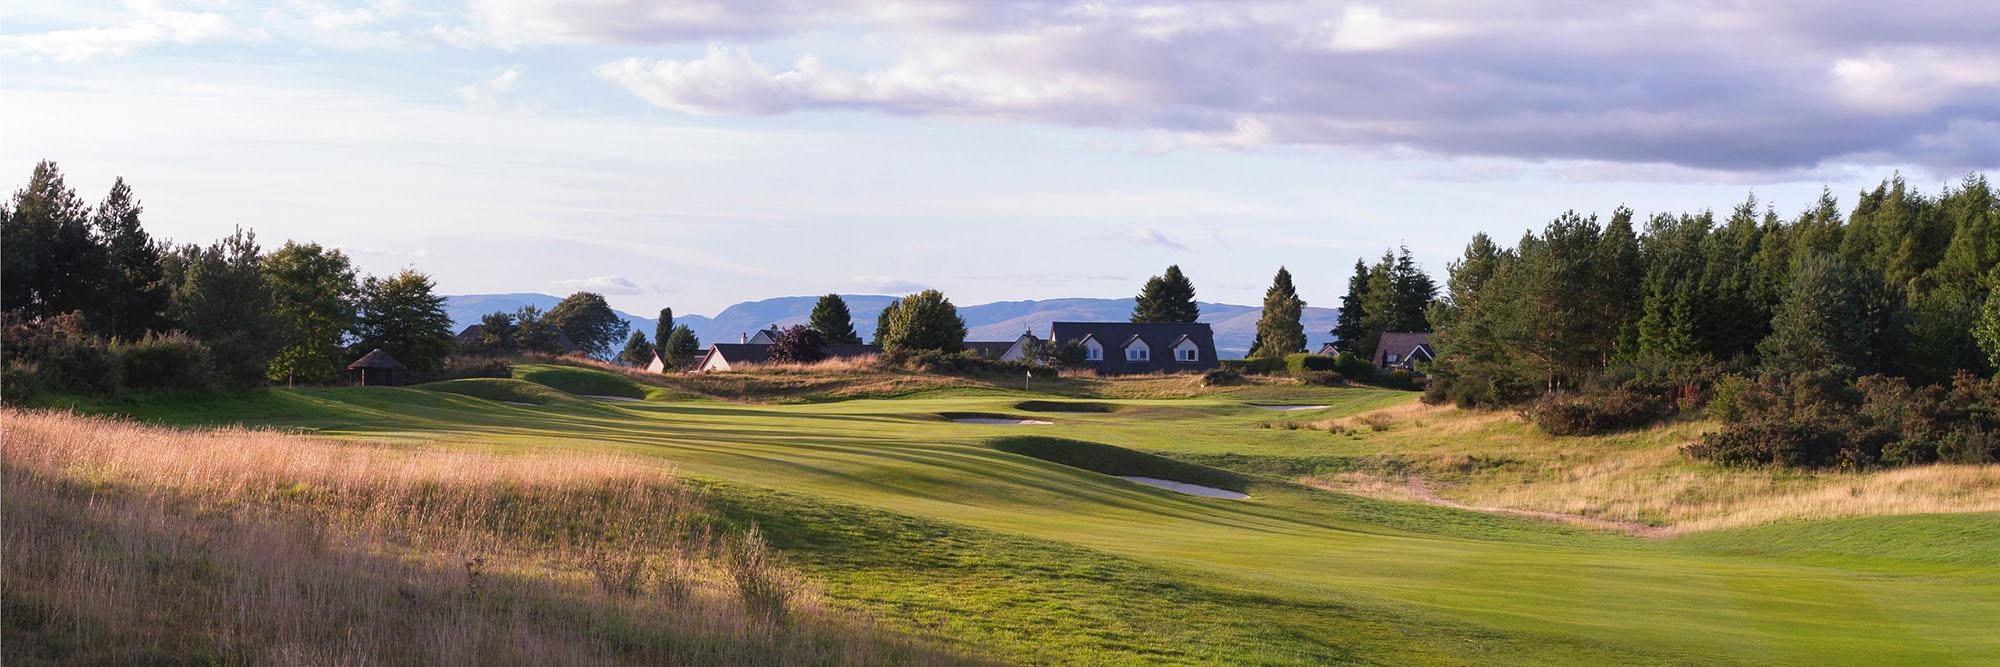 Golf Course Image - Gleneagles PGA Centenary Course No. 14